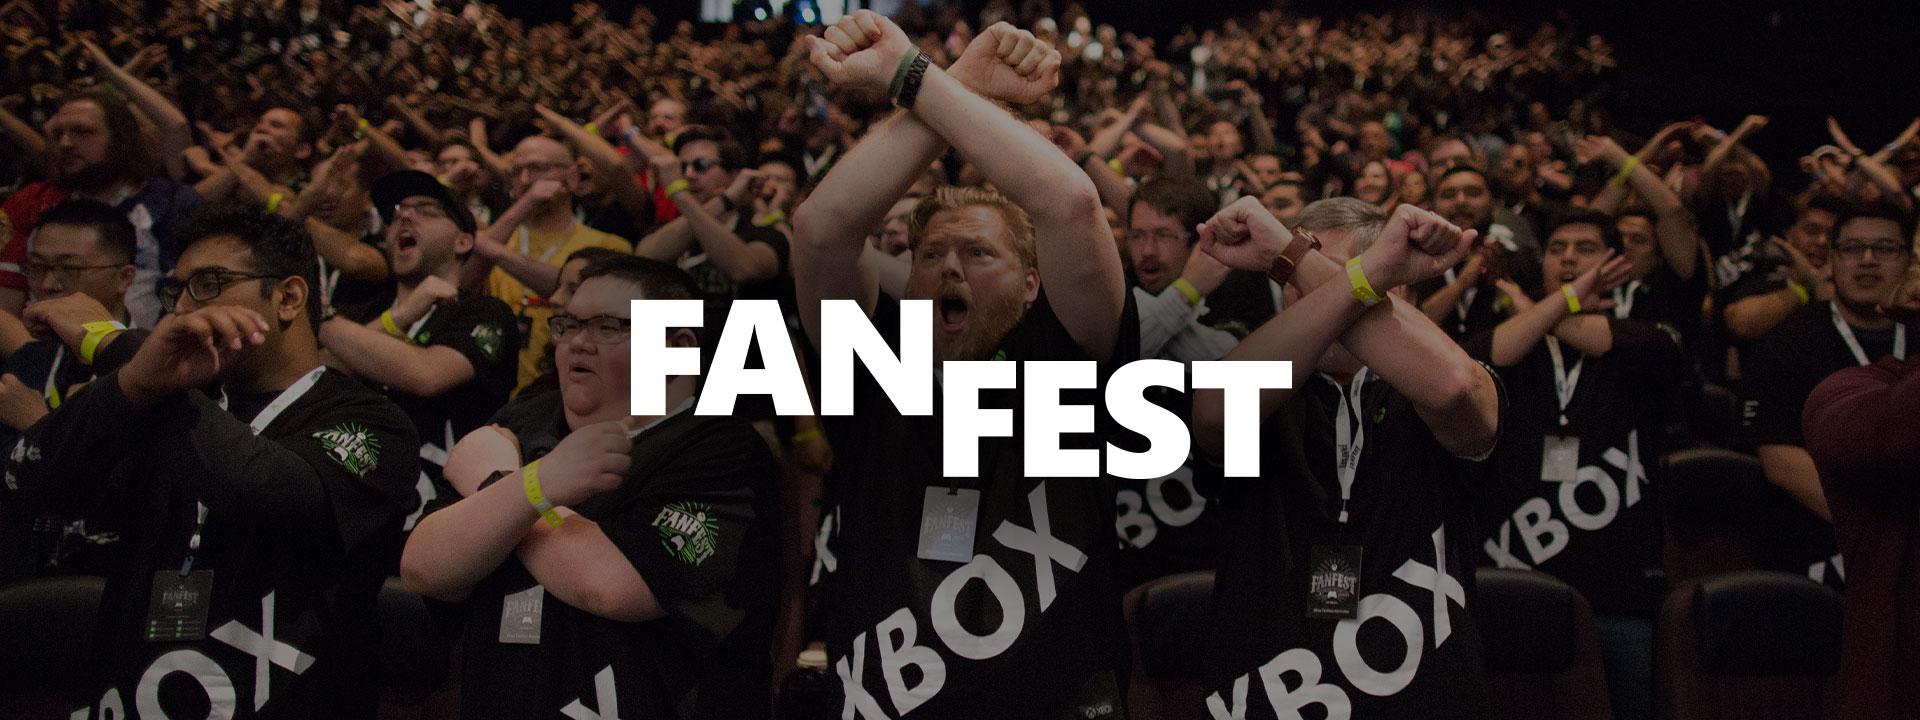 Ya puedes registrarte para el Xbox FanFest